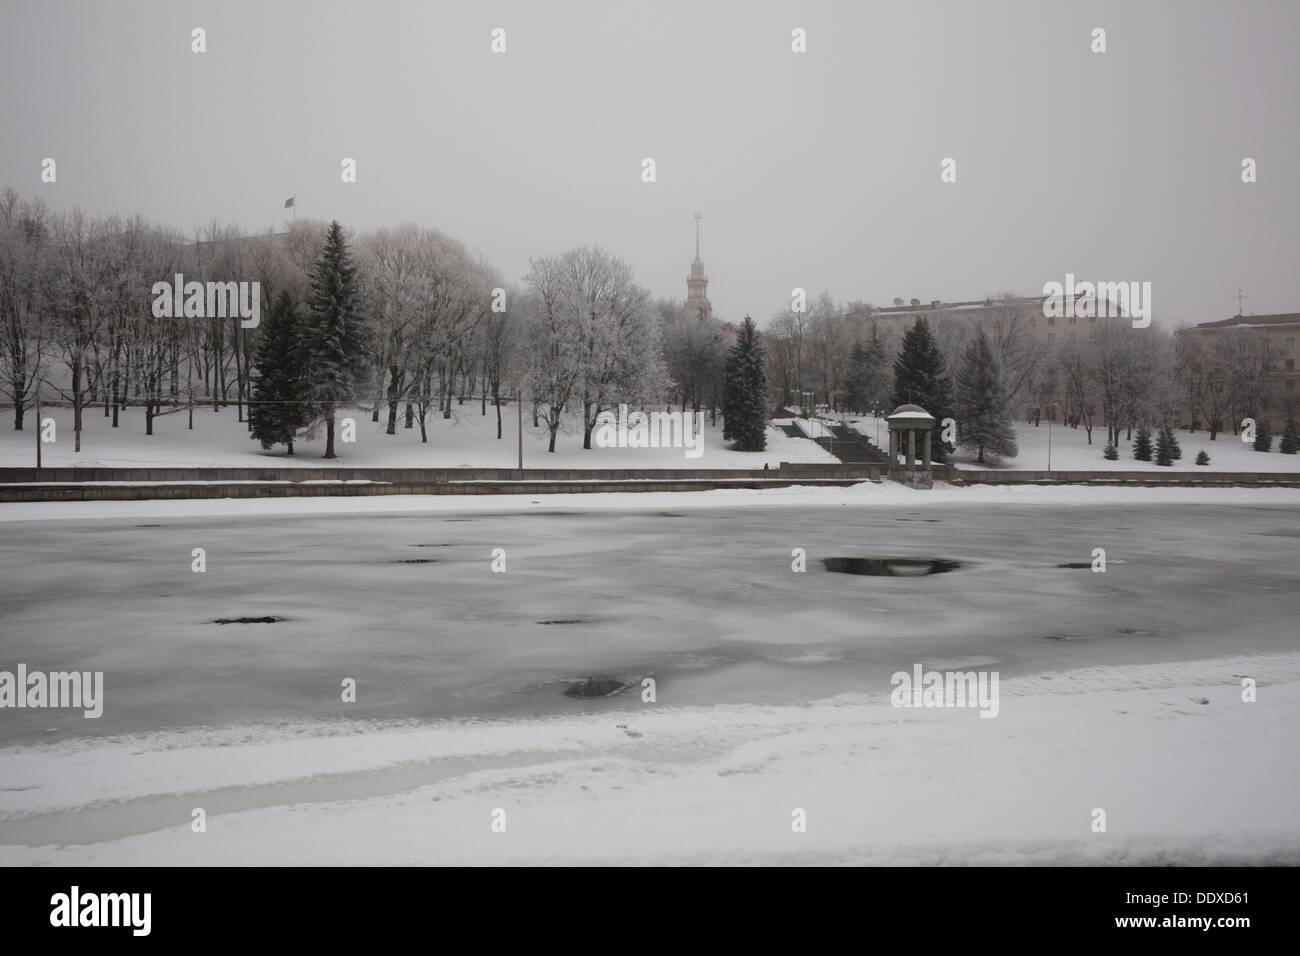 Along the banks of the frozen Svislach River. Minsk, Belarus. Stock Photo